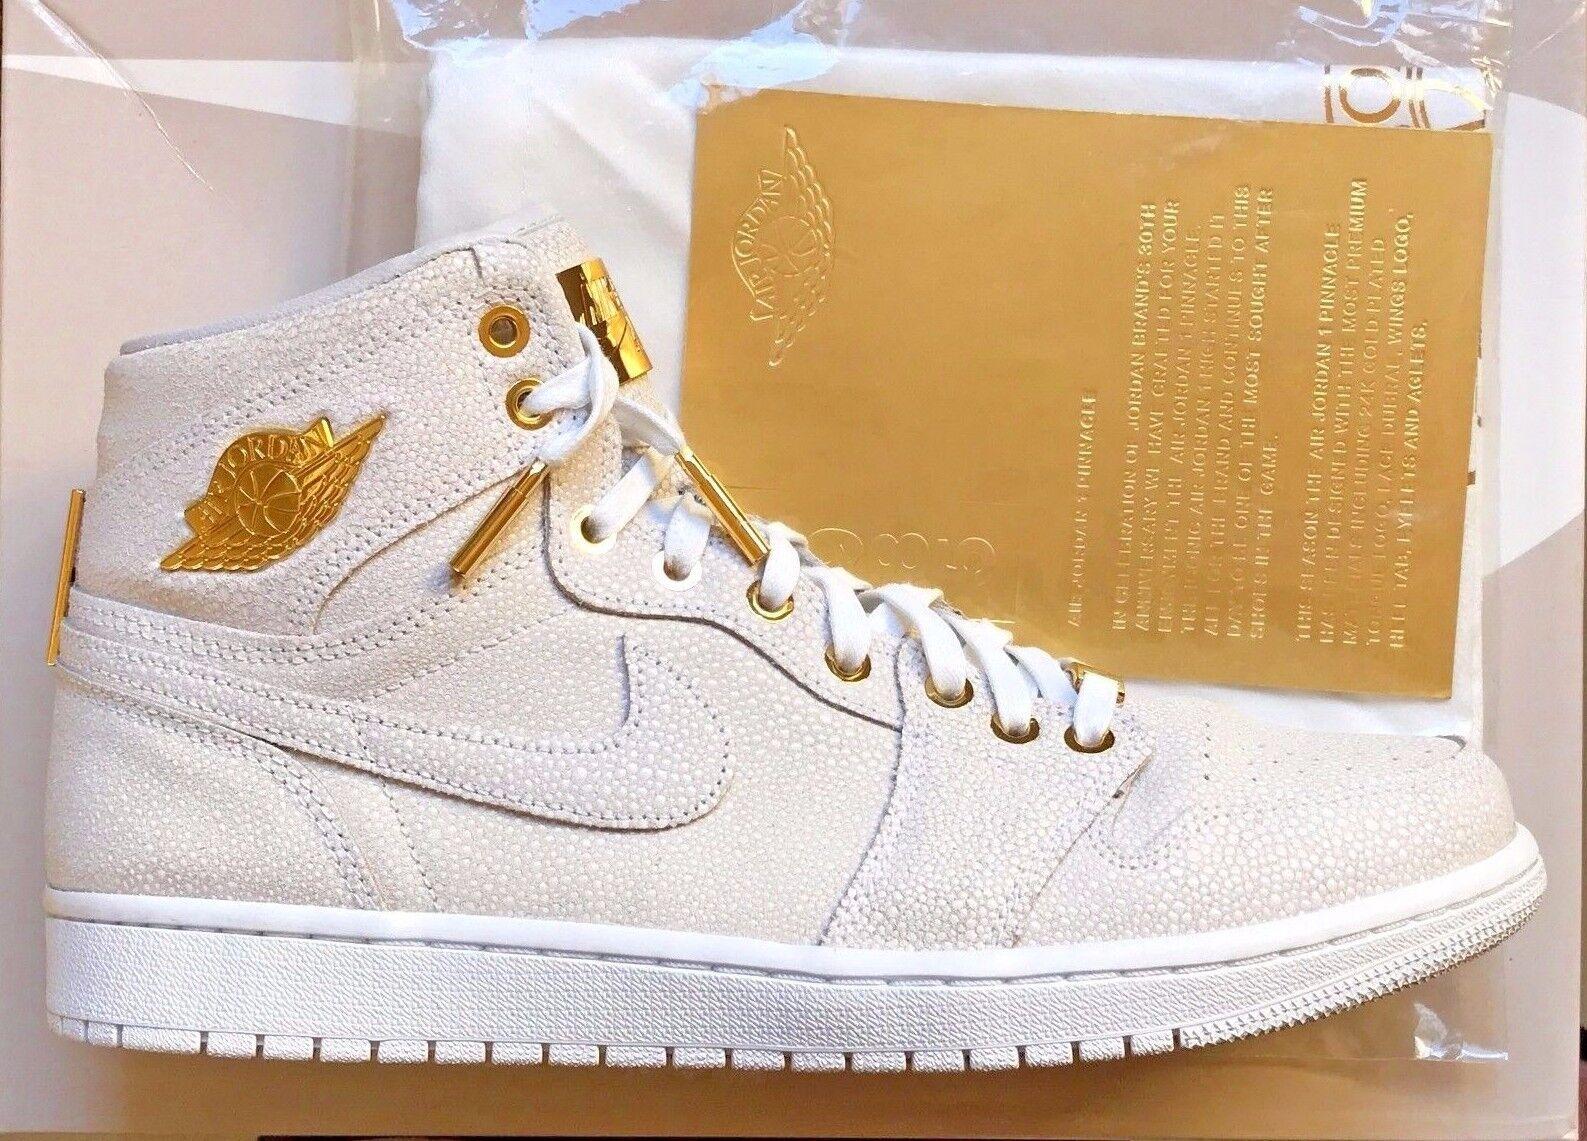 Nike Air Jordan 1 Pinnacle 24K Gold